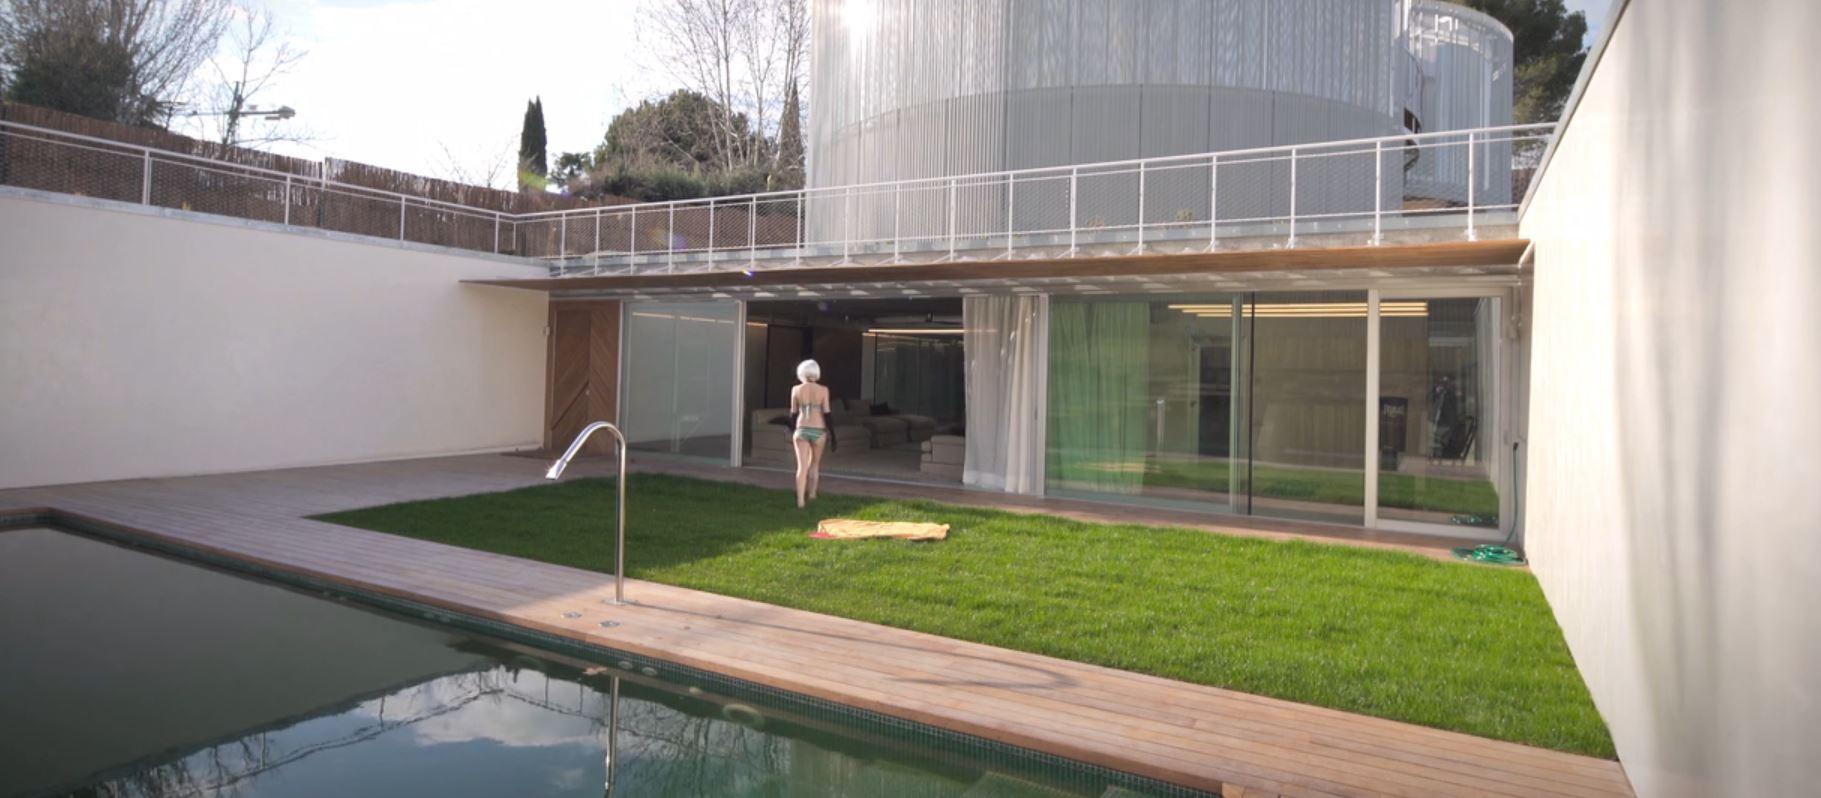 Dise o bioclim tico en las fachadas de las viviendas for Frentes de viviendas